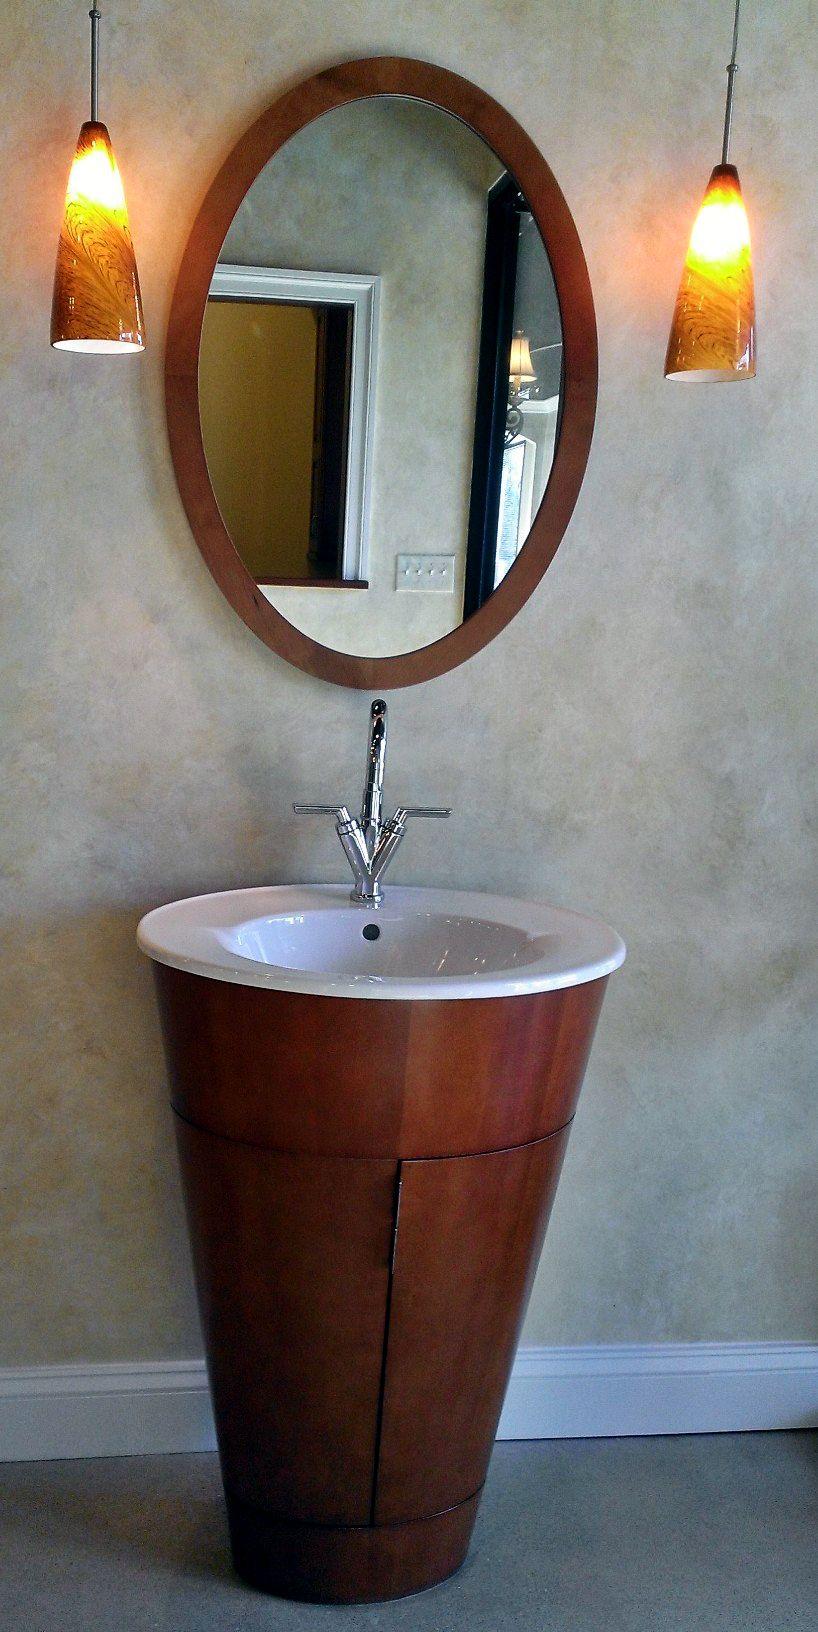 Modern bathroom vanity design kenwood kitchens in for Bathroom remodeling columbia md